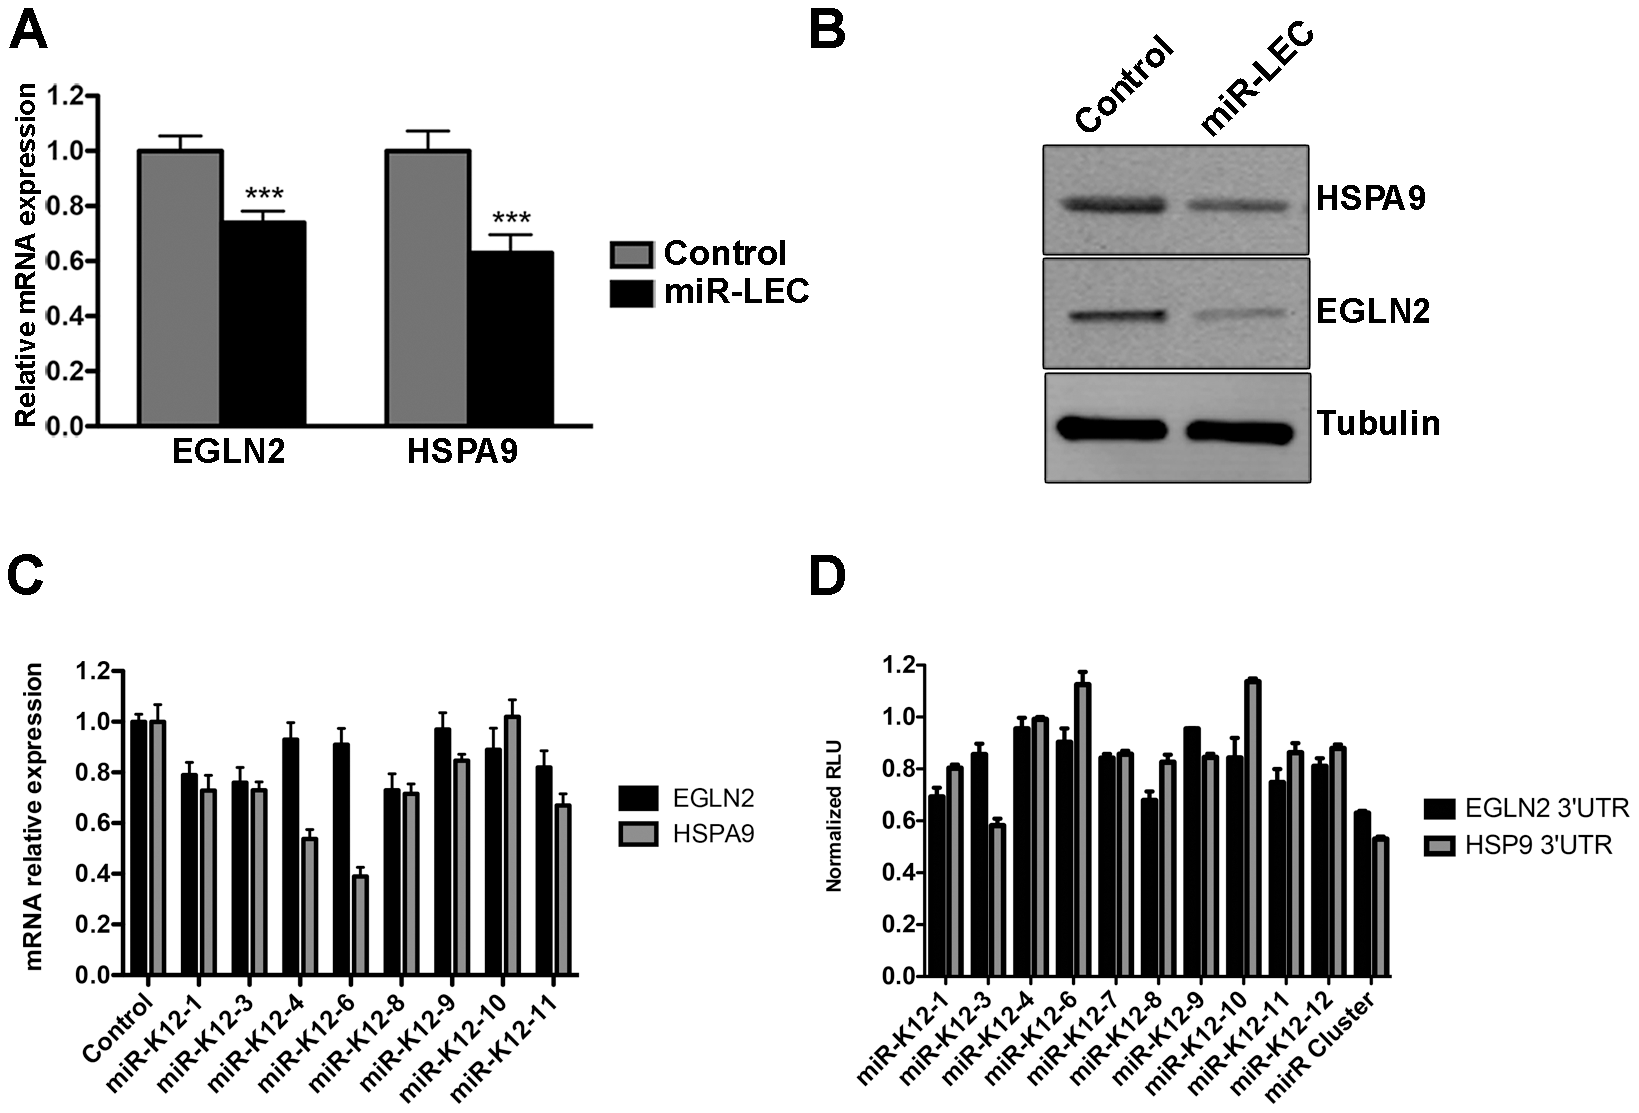 The KSHV miRNA cluster regulates EGLN2 and HSPA9.